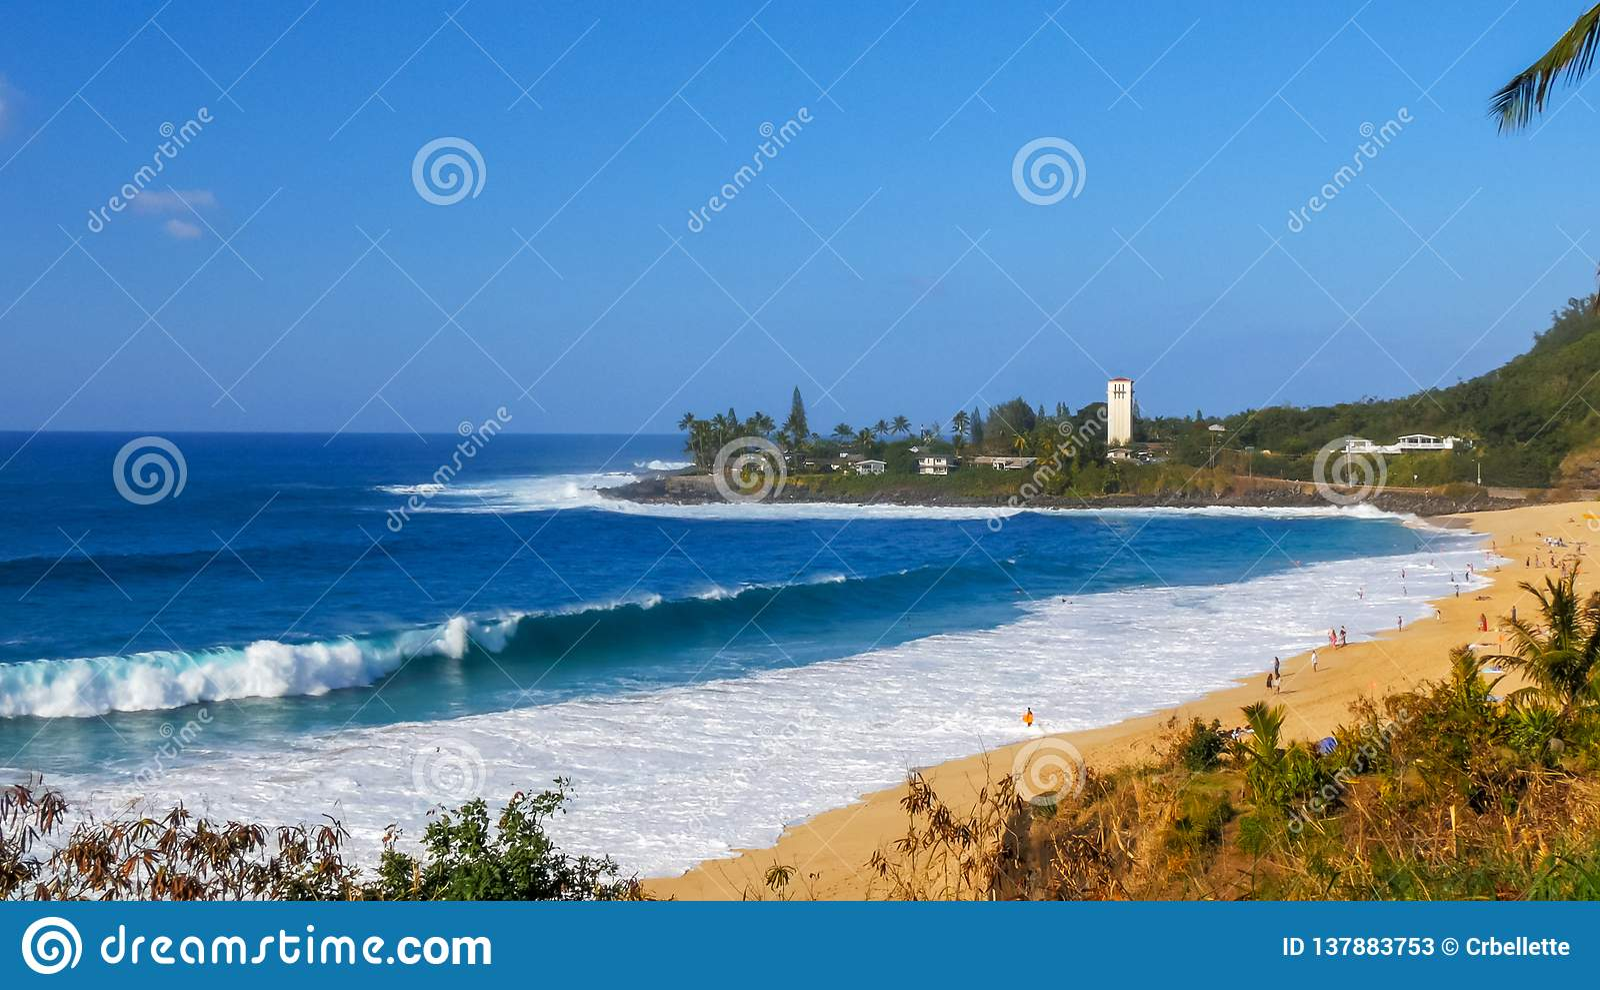 Rupturas da onda na praia no lugar grande famoso da onda, baía do waimea